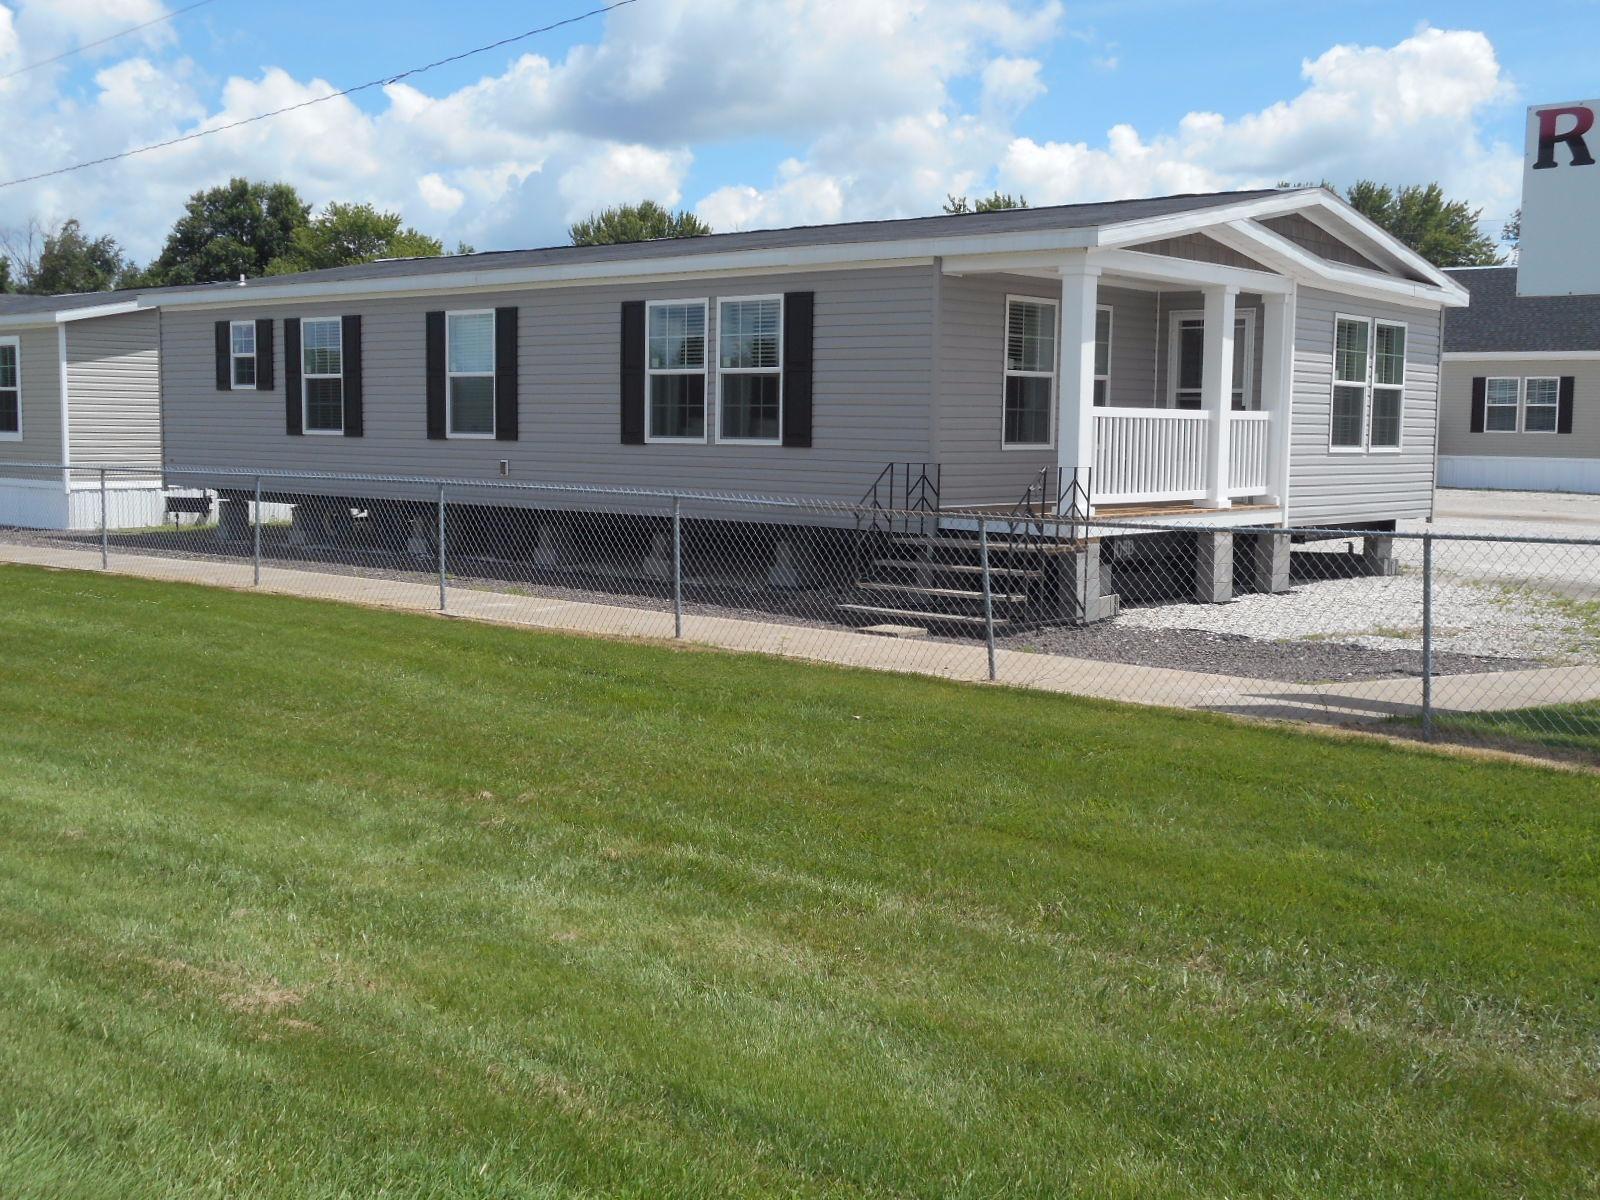 Ramsey jones homes inc in lagrange mo 573 655 2 for Missouri home builders